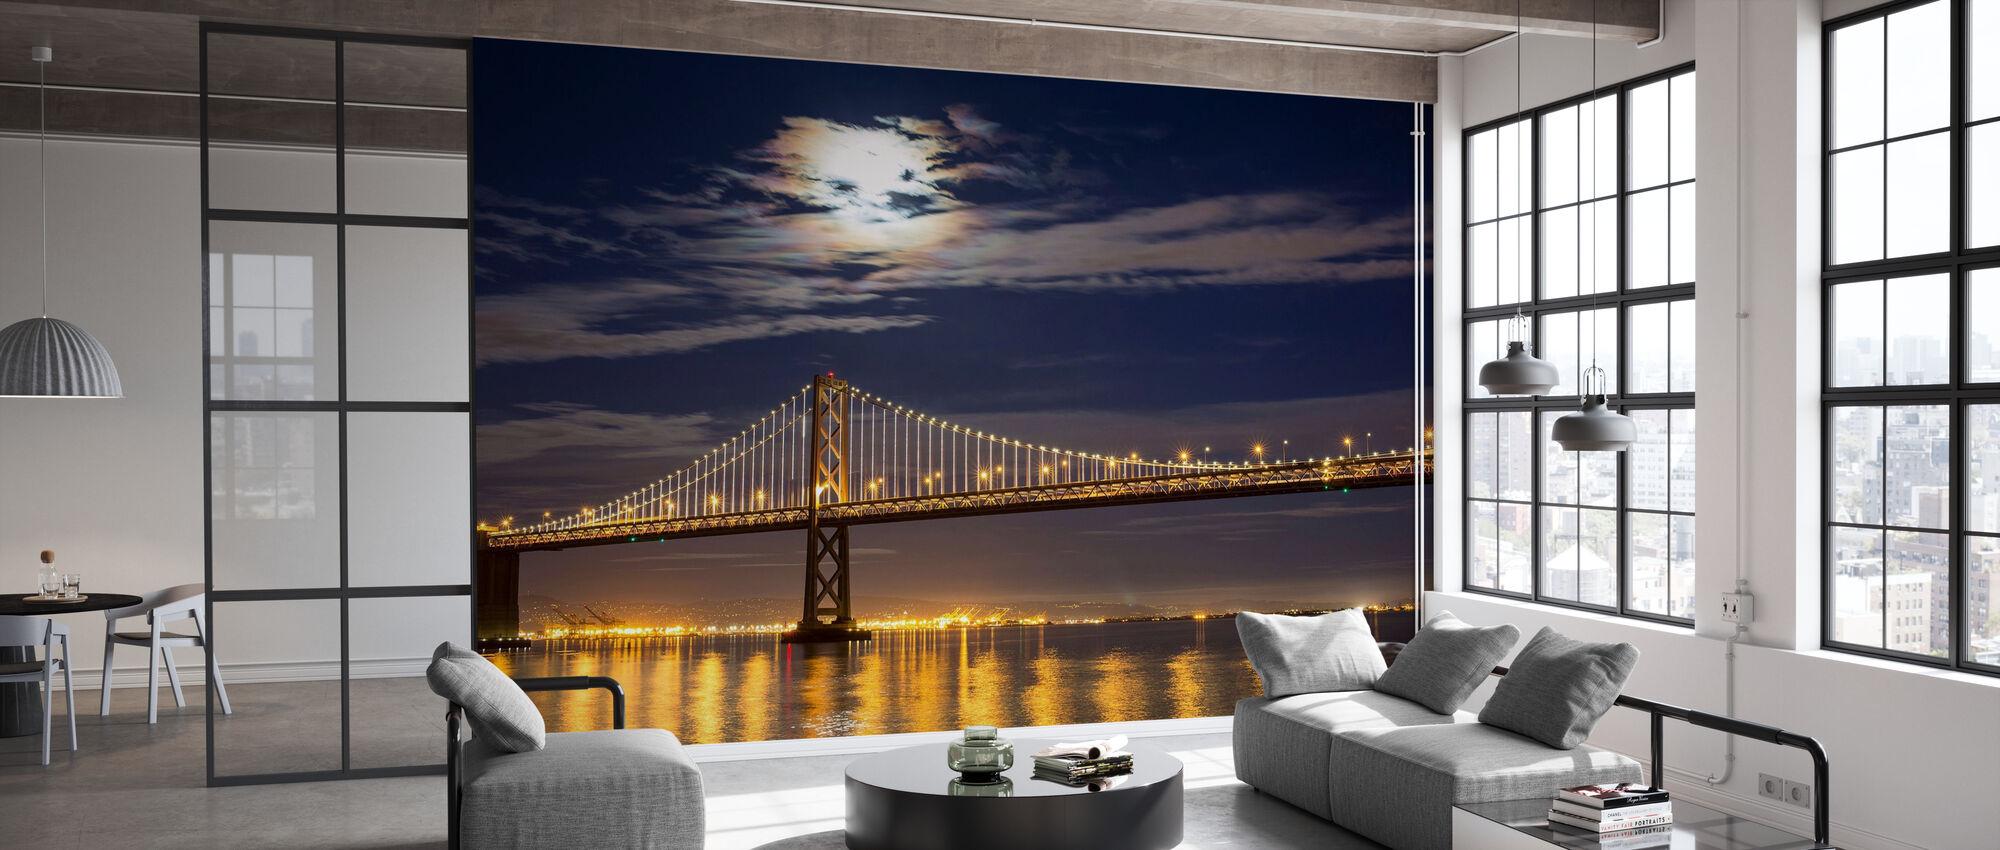 Moonrise over Bay Bridge - Wallpaper - Office